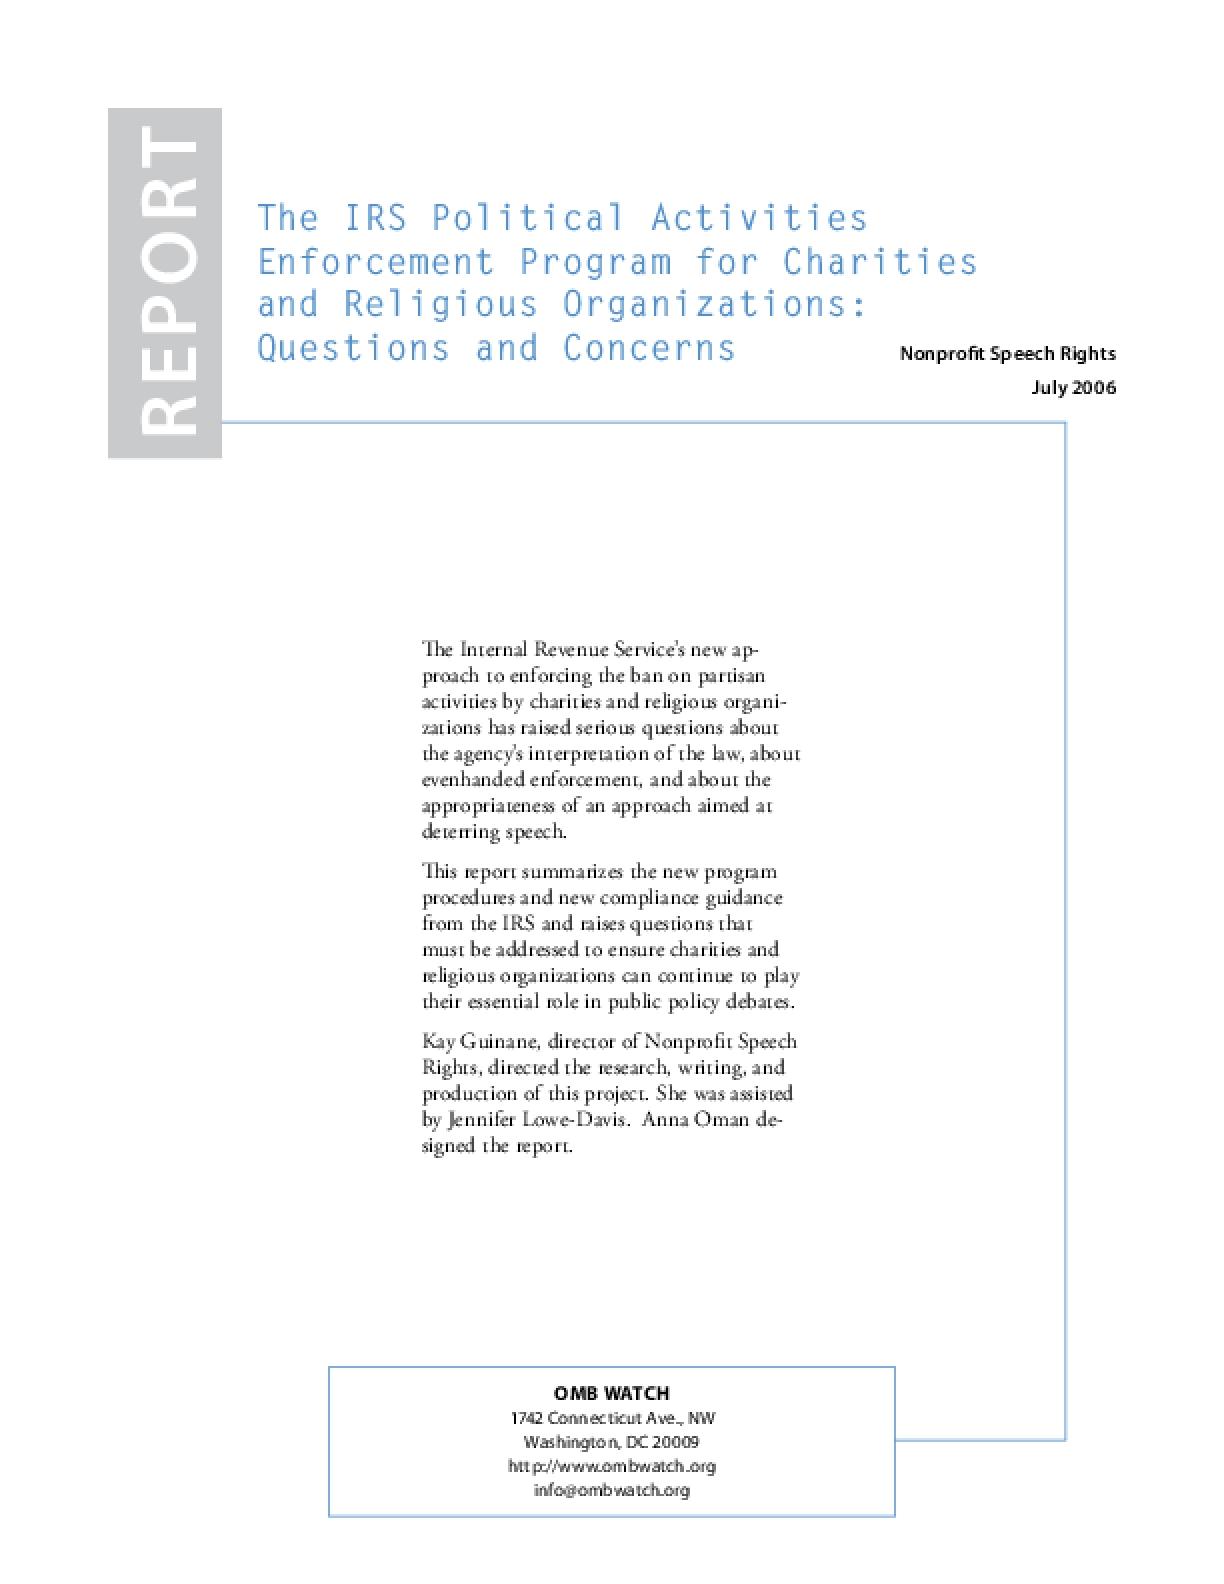 IRS Political Activities Enforcement Program for Nonprofit Groups: Questions & Concerns